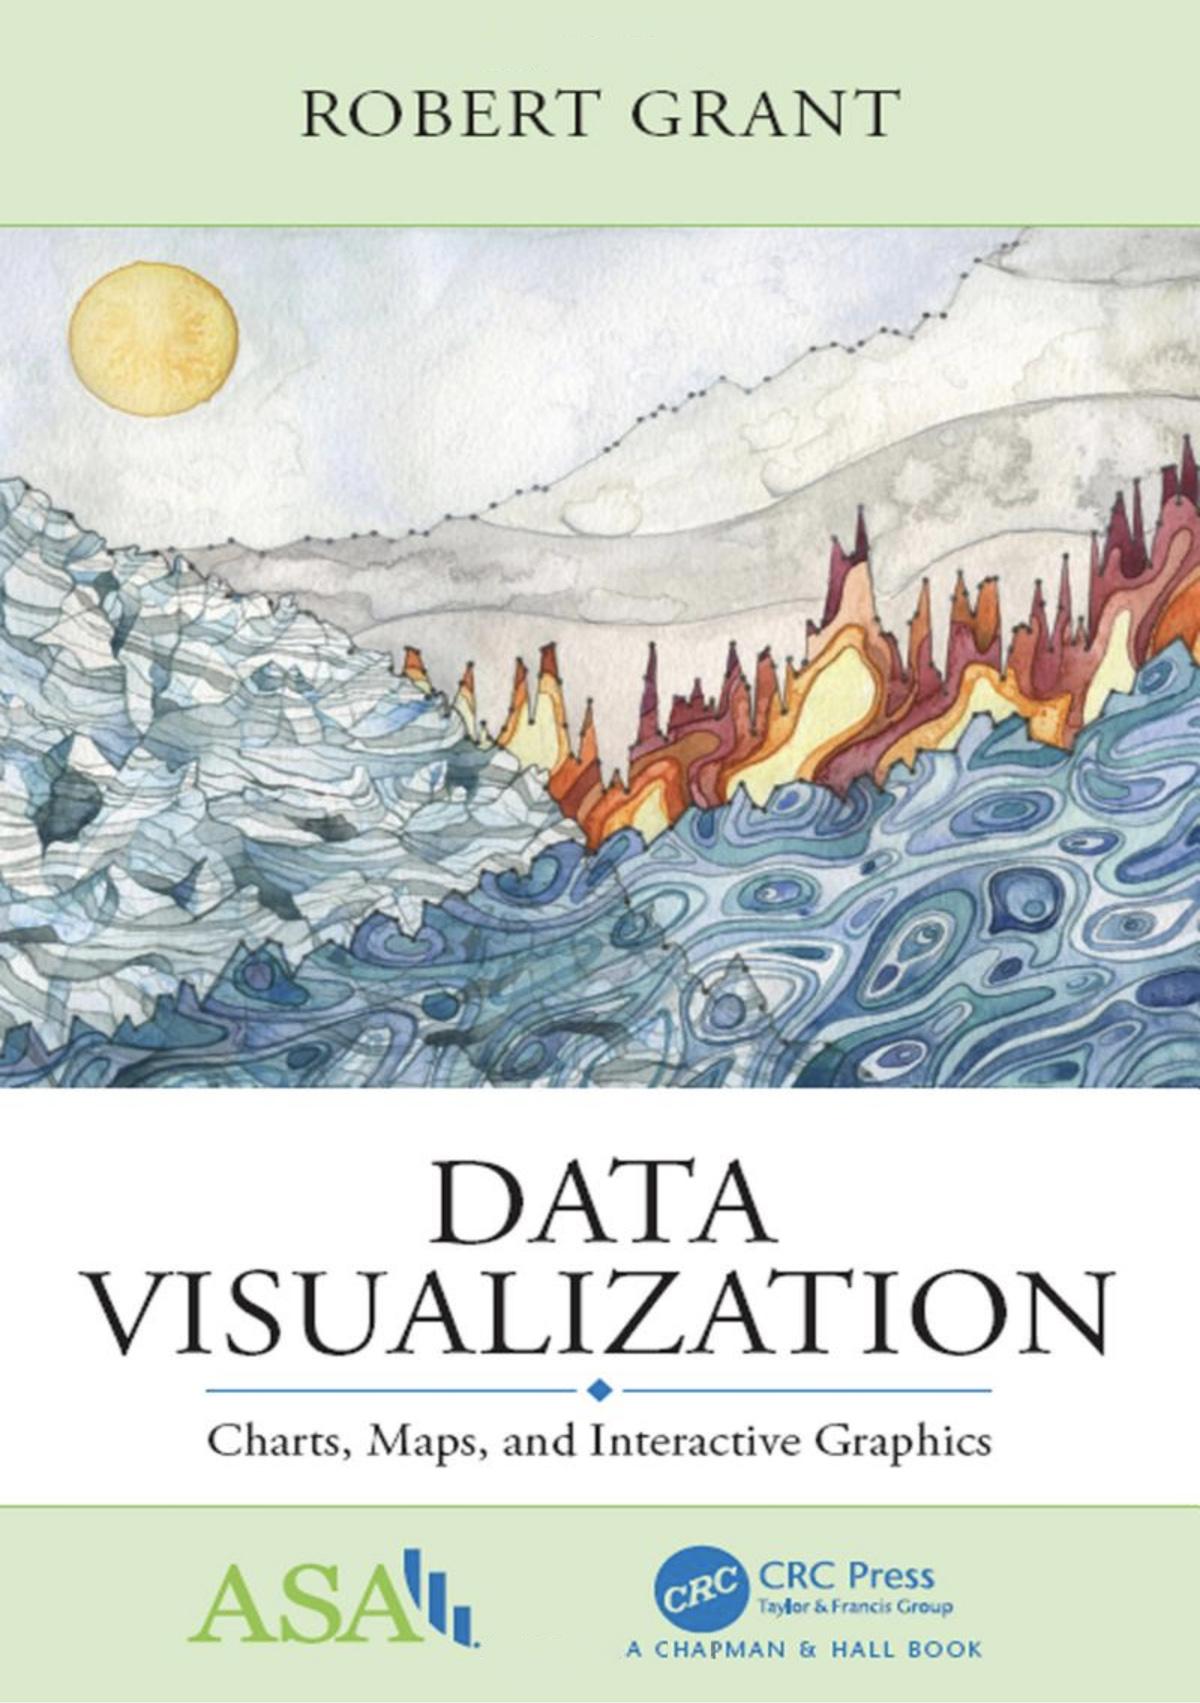 Data Visualization: Charts, Maps, and Interactive Graphics